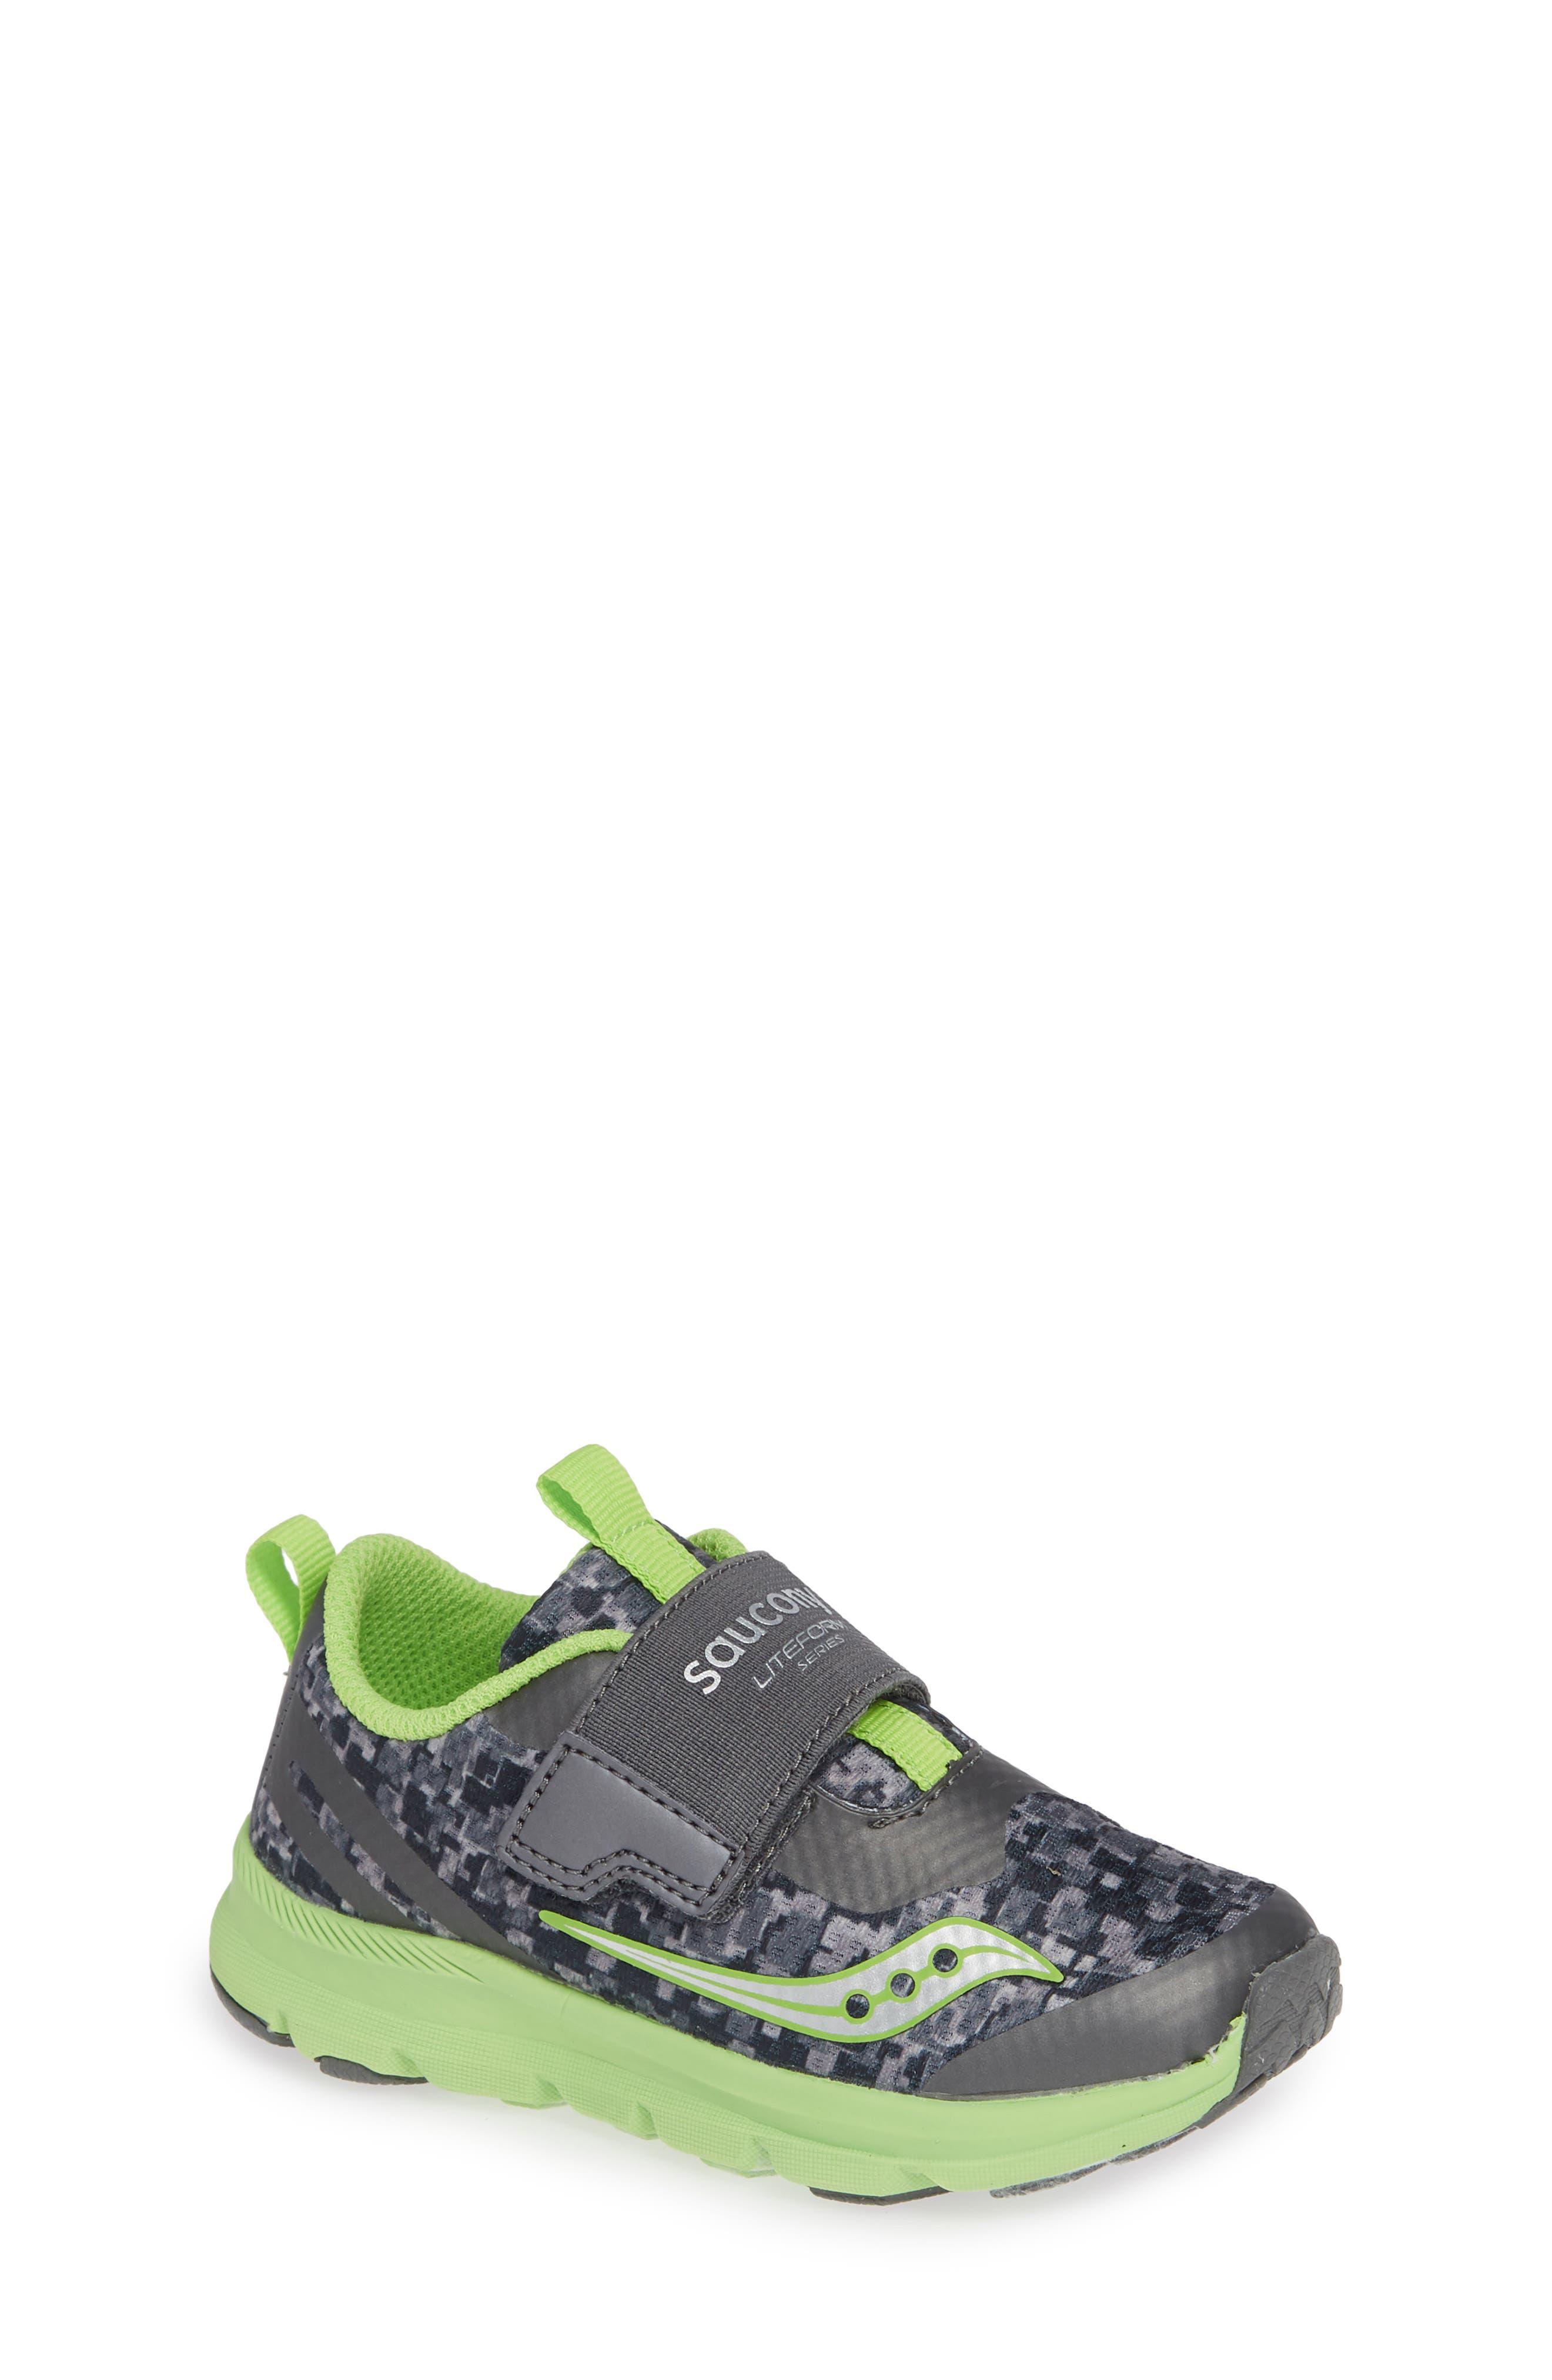 Baby Liteform Sneaker,                         Main,                         color, GREY/ GREEN